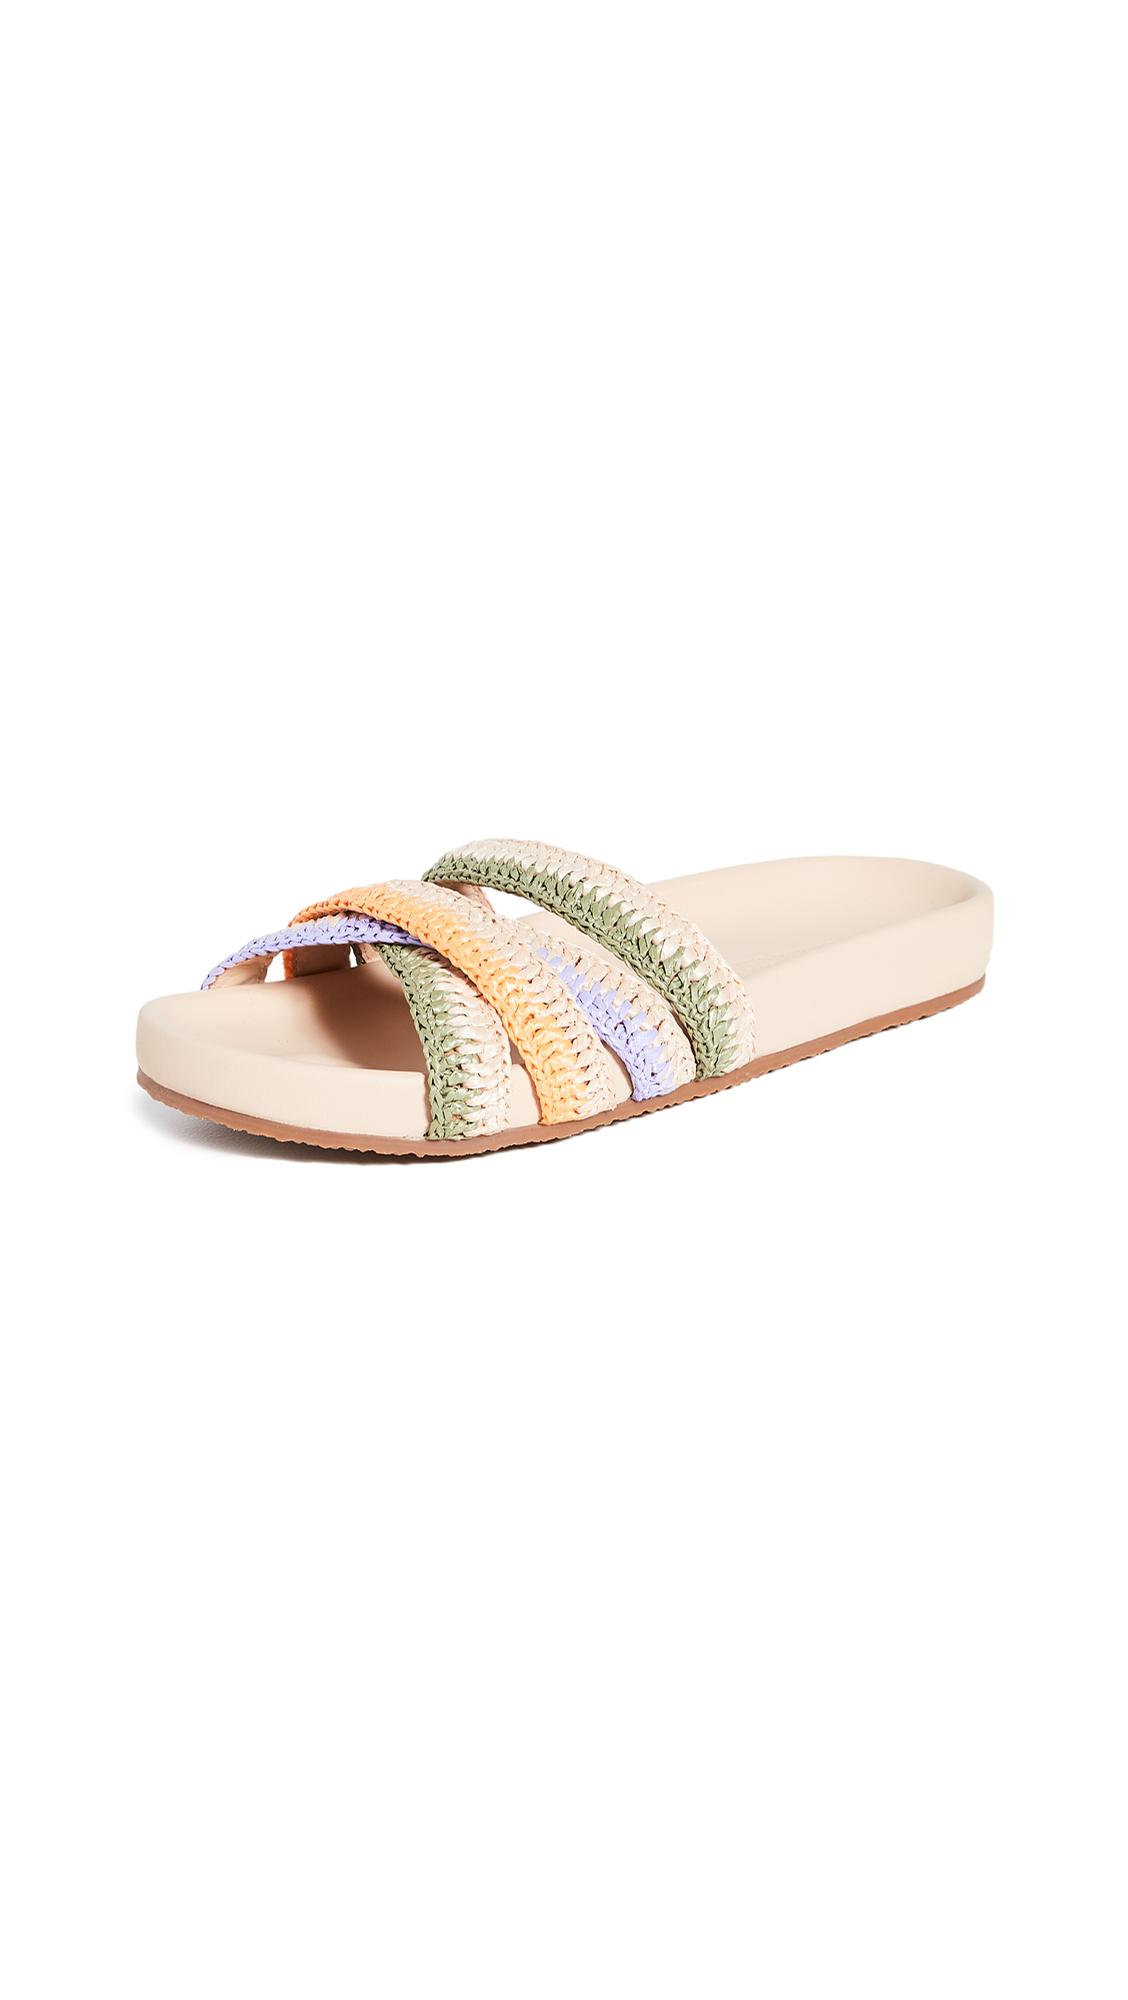 Buy Ulla Johnson Makena Sandals online, shop Ulla Johnson